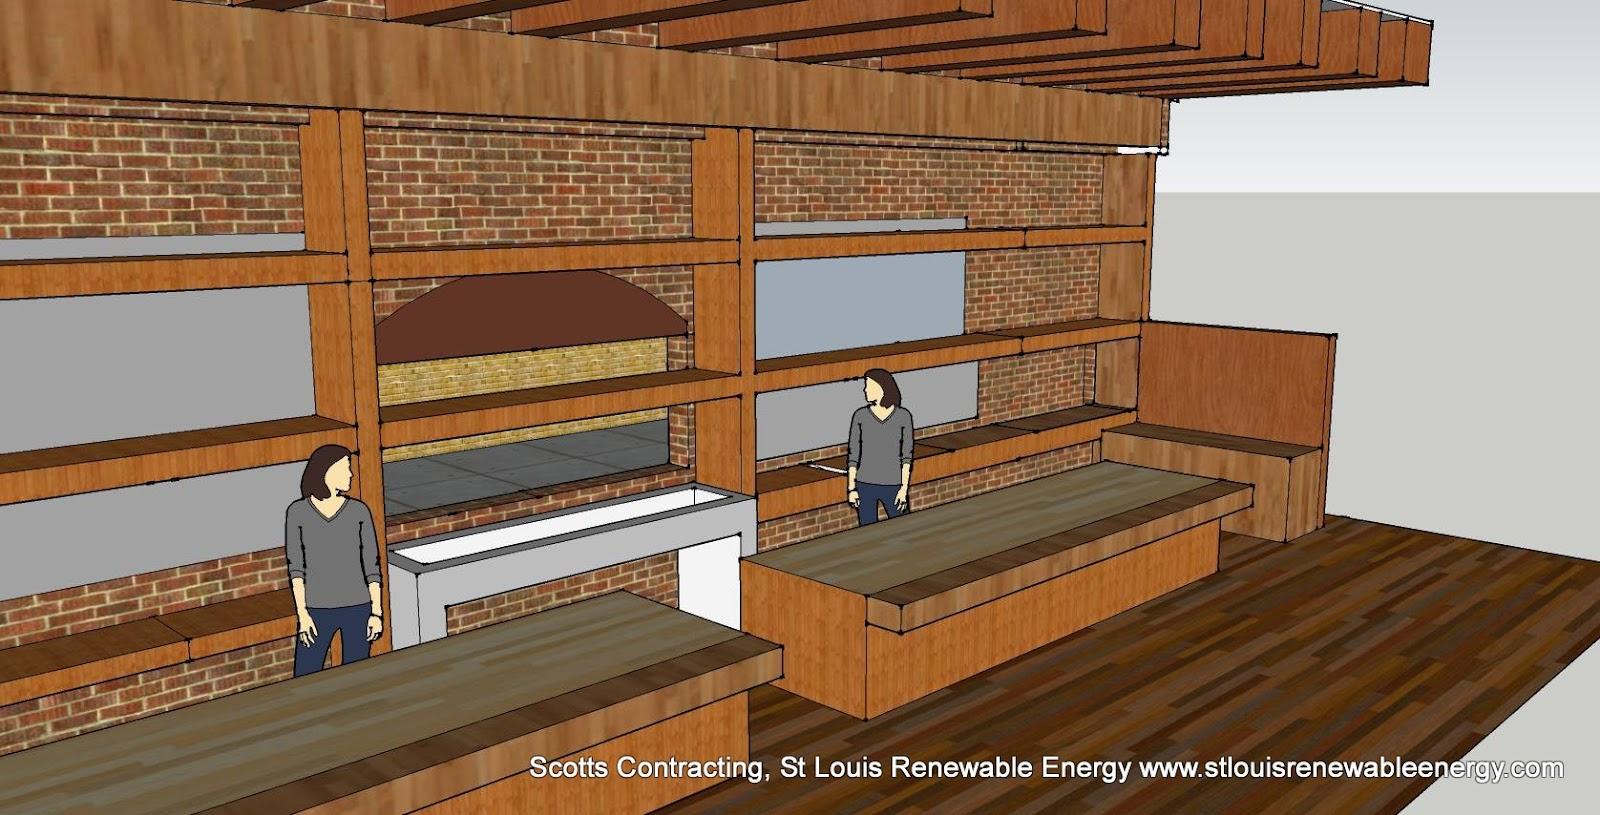 Stlouis Renewable Energy Cad Bar Designs Before Photos